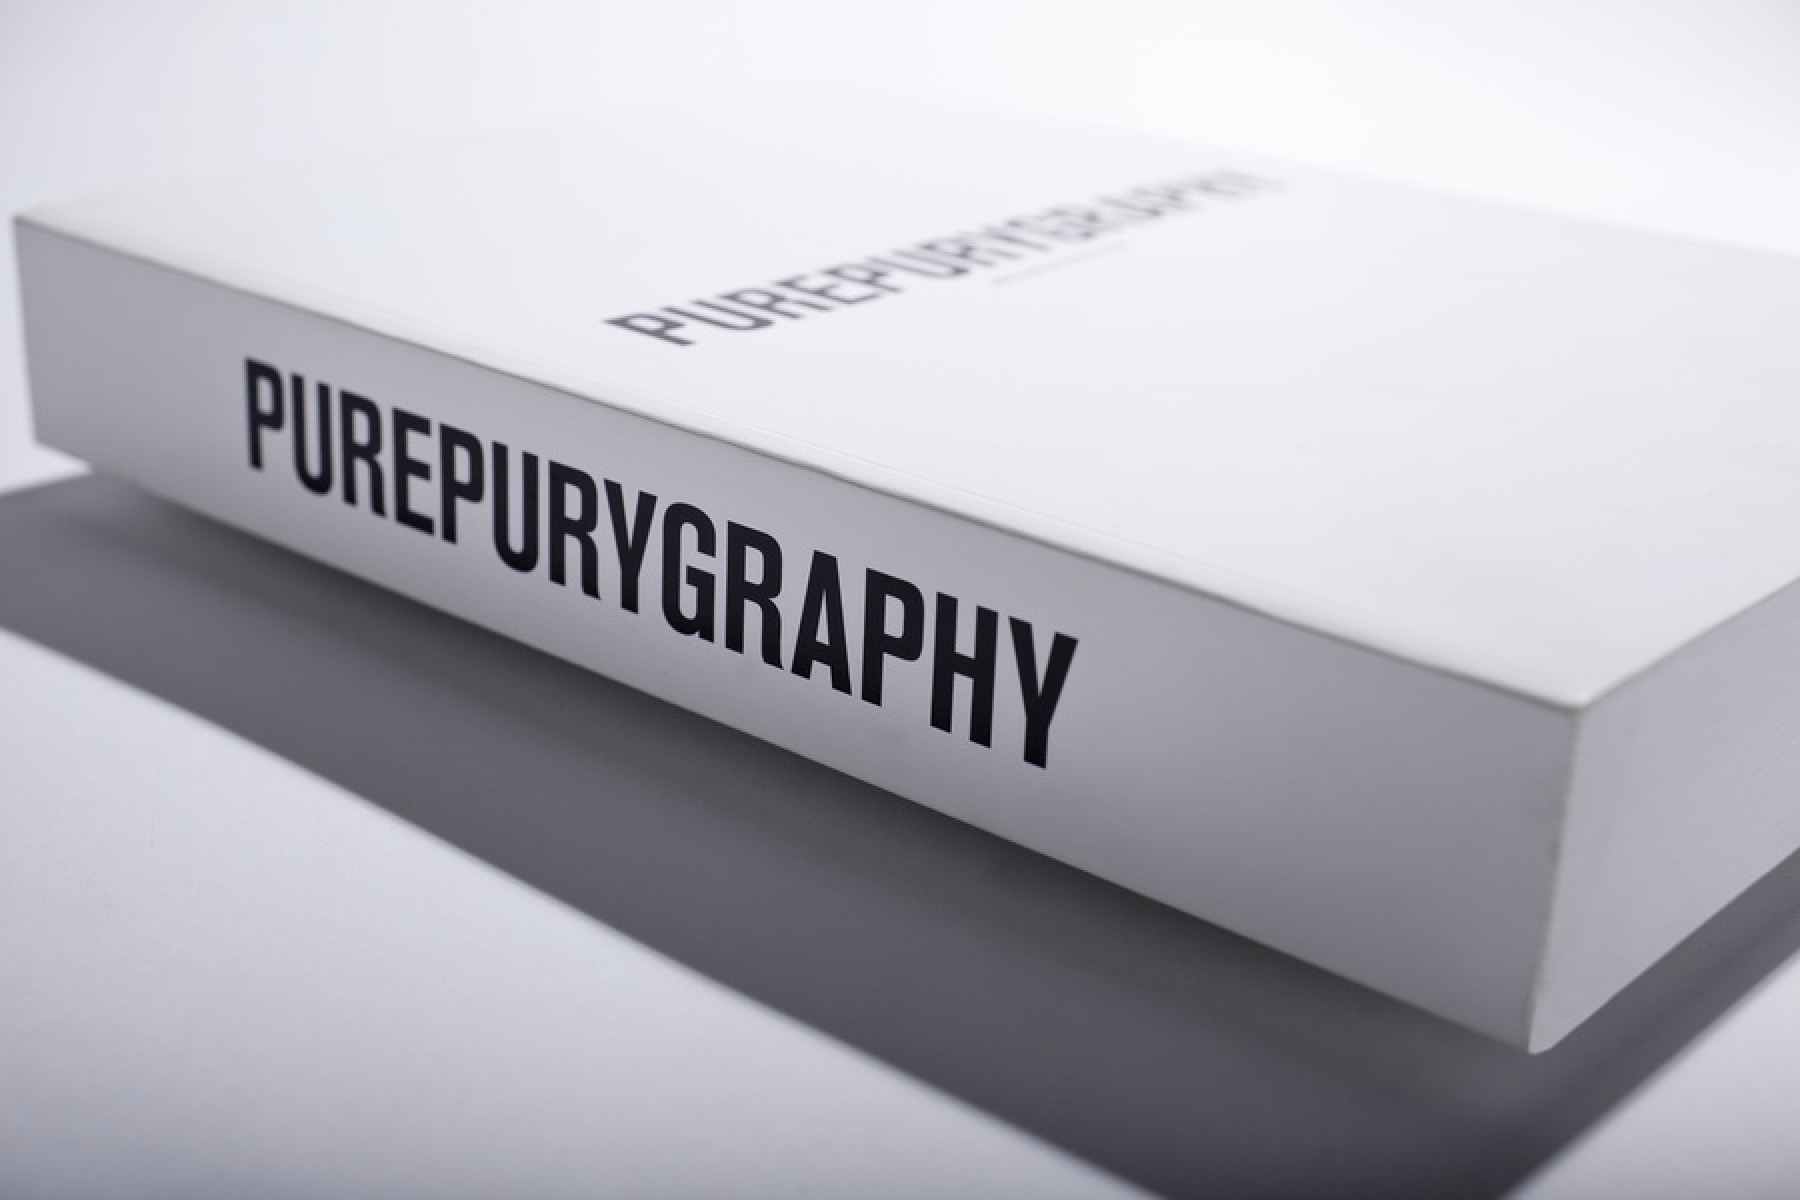 PUREPURYGRAPHY